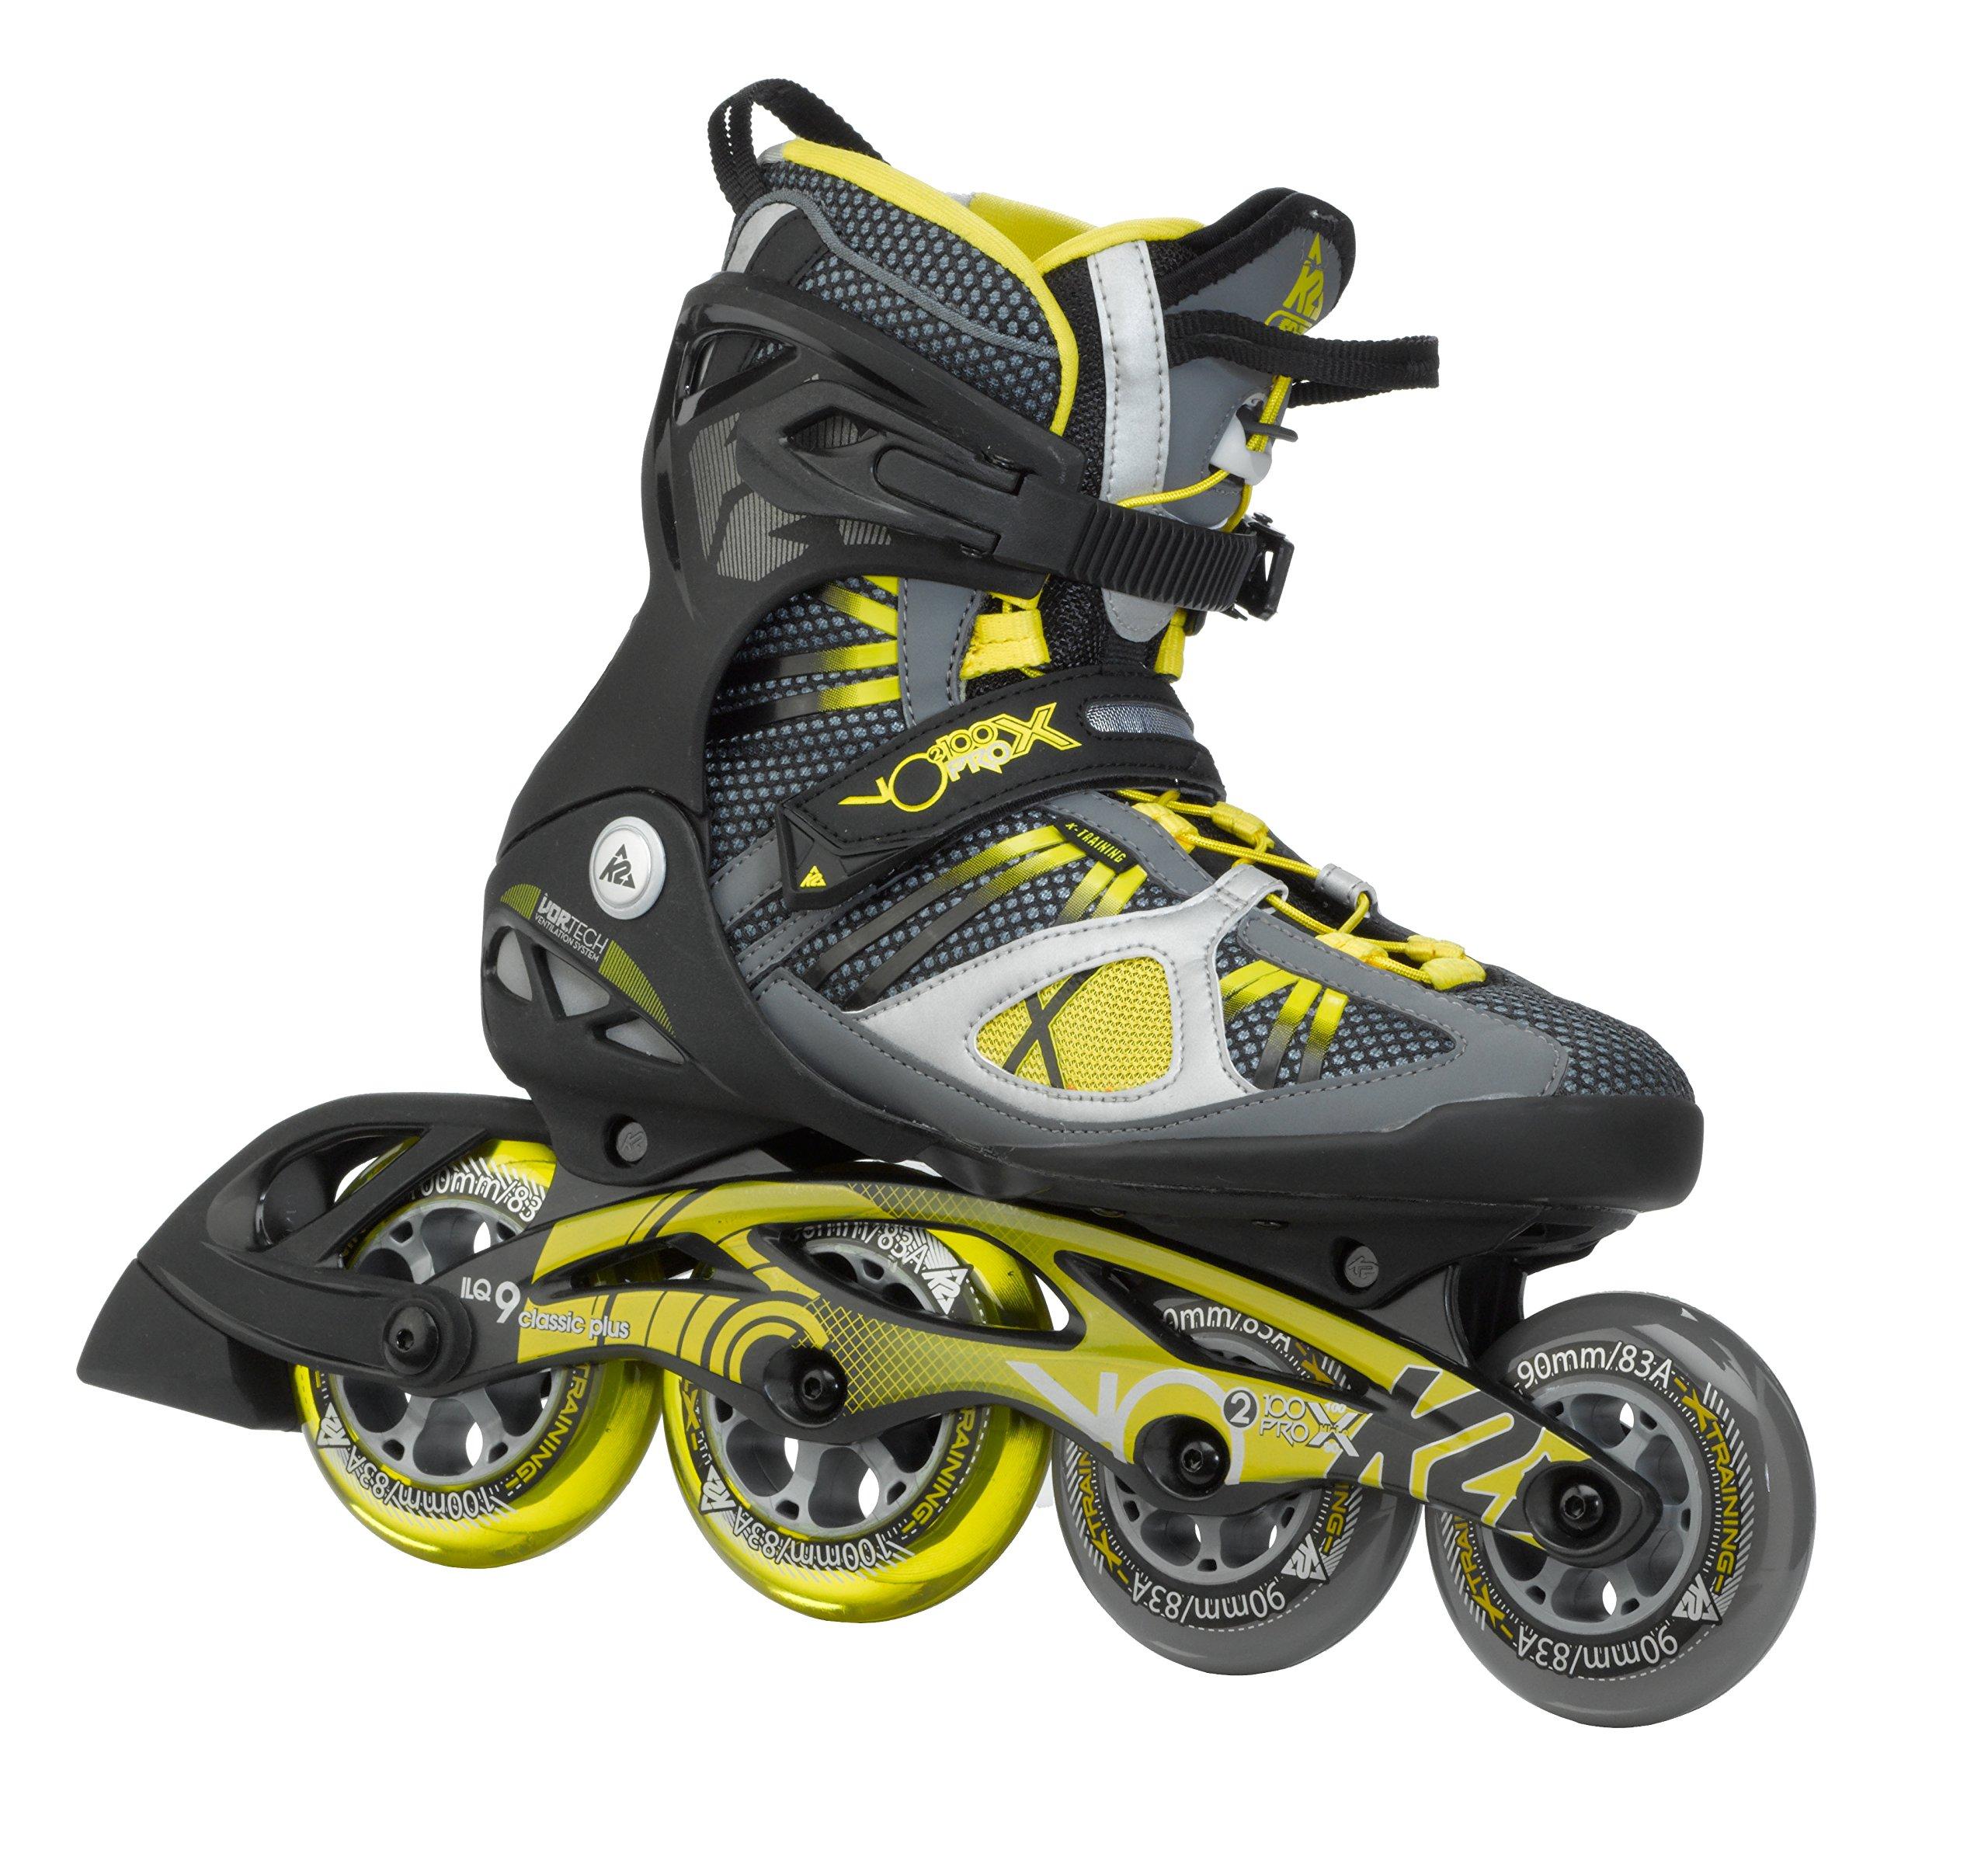 K2 Skate Men's V02 100 X Pro Inline Skates, Black/Yellow, 5 by K2 Skate